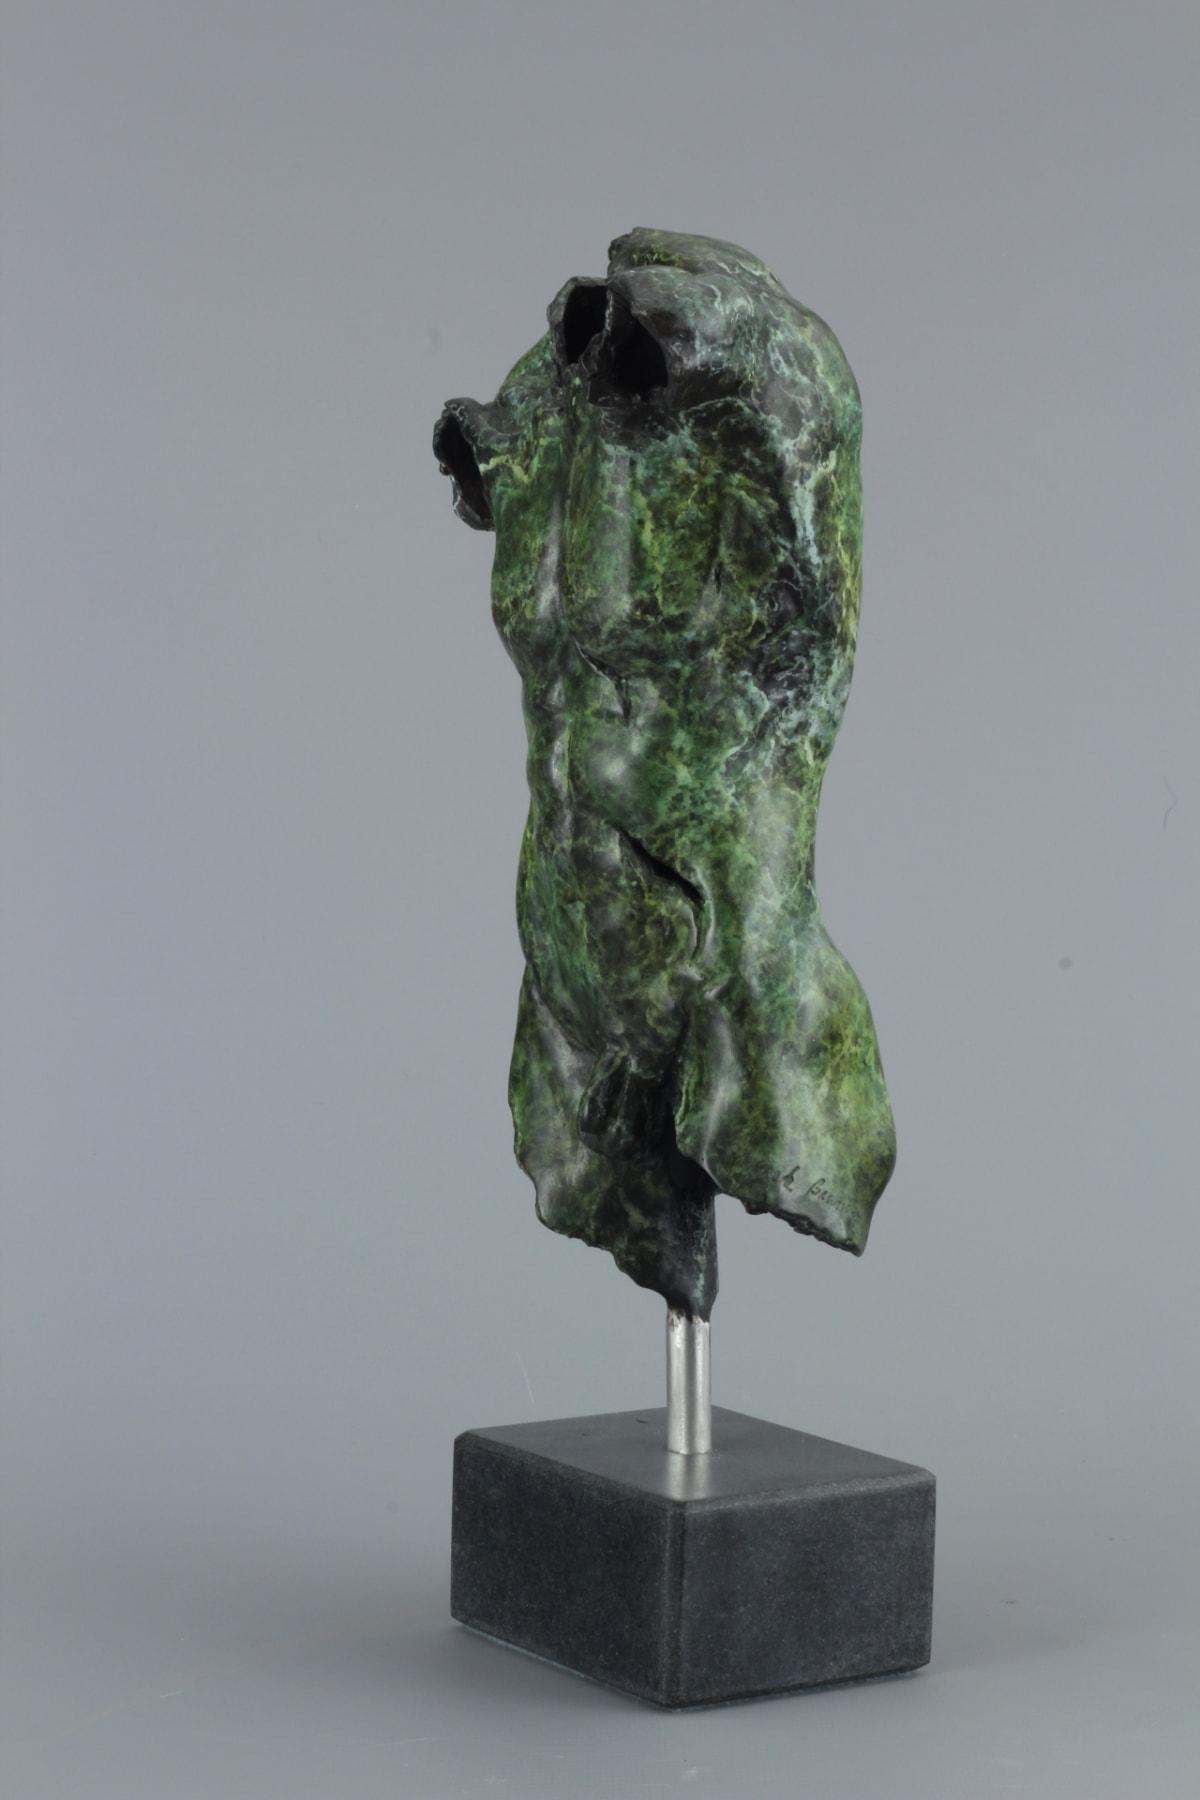 Mirek Brandejs Small Male Torso, 2018 Bronze Sculpture 35 x 11 x 8 cm 13 3/4 x 4 3/8 x 3 1/8 in Edition 1 of 30